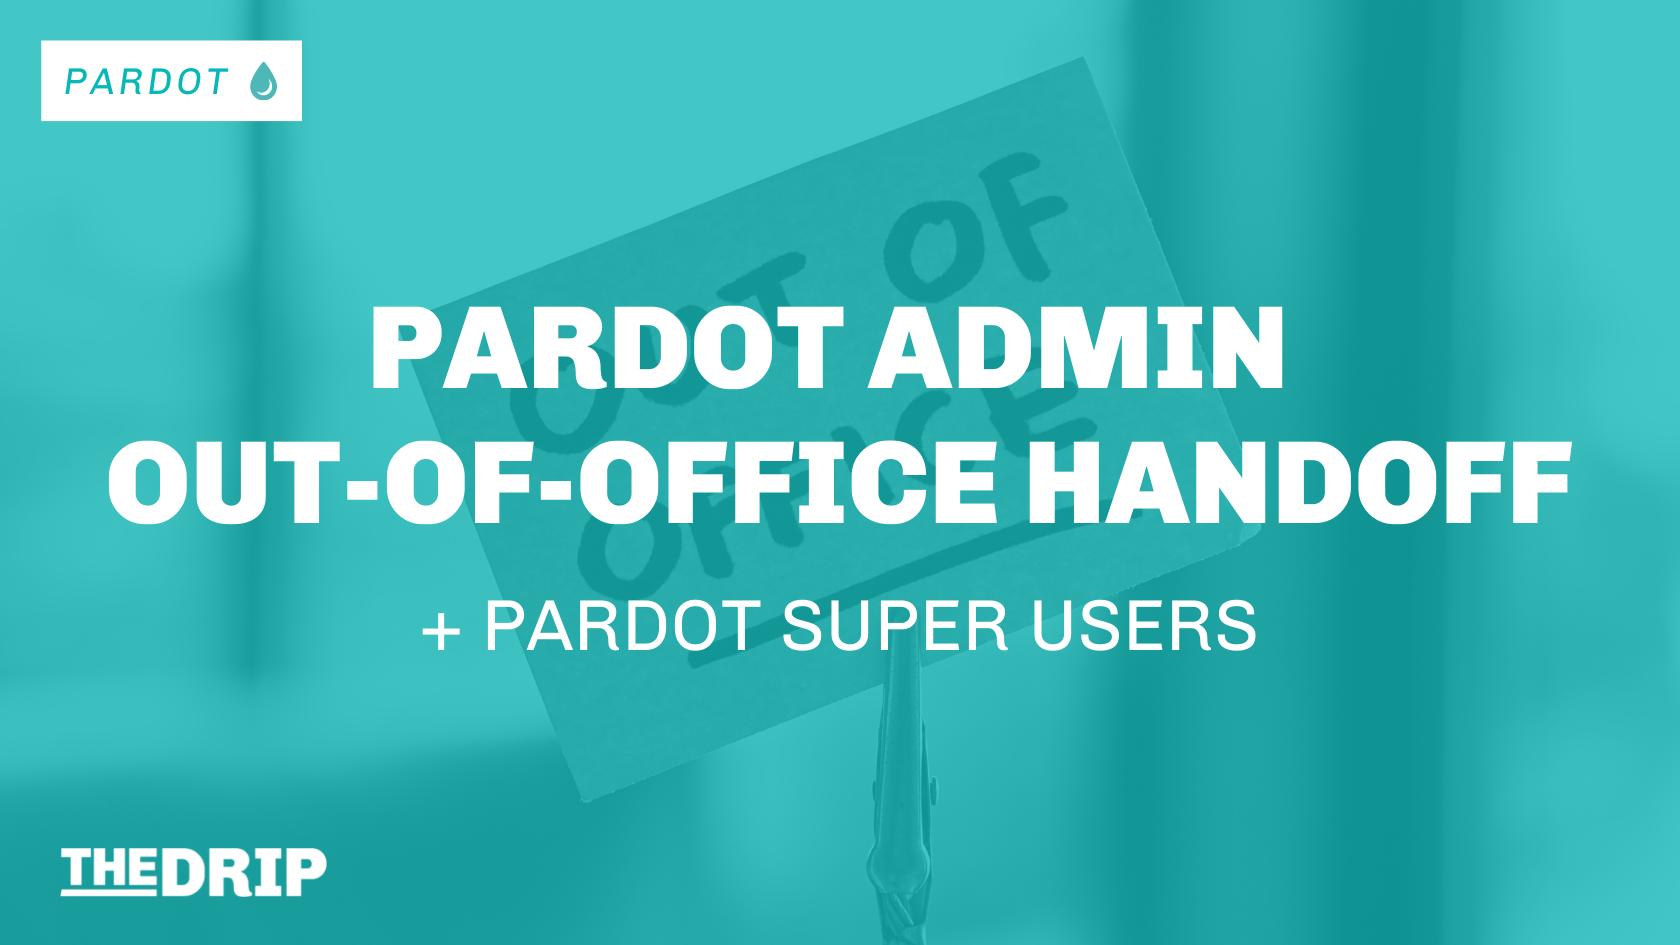 Pardot Admin Out-of-office Handoff (Salesforce Marketing Setup Administrator)